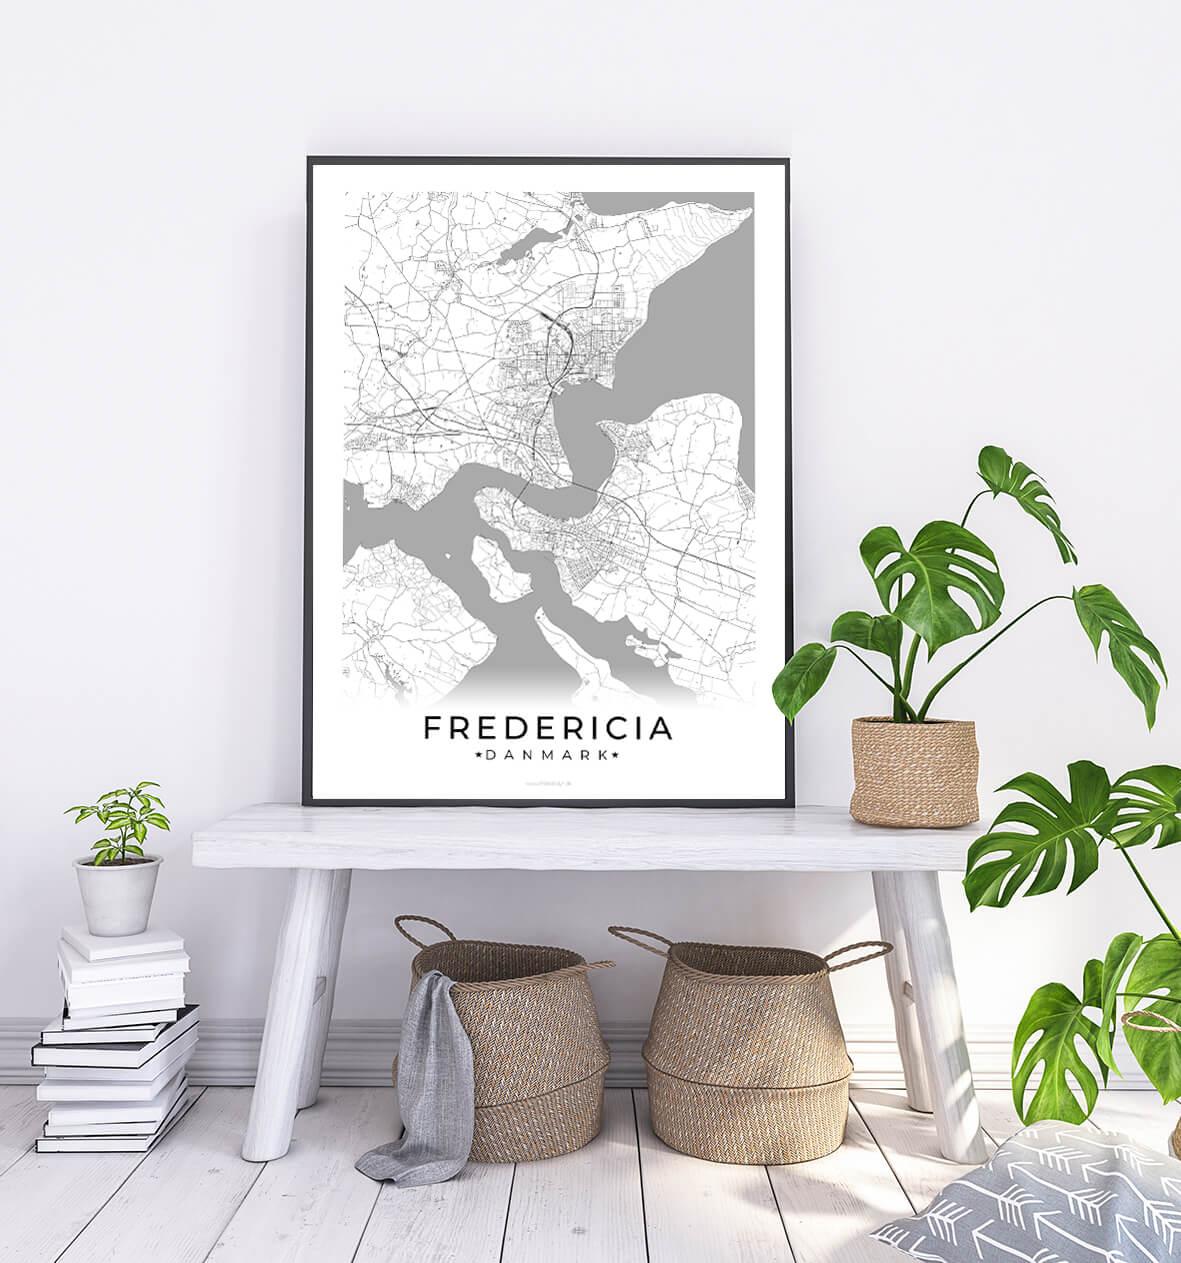 Fredericia-hvid-byplakat-1